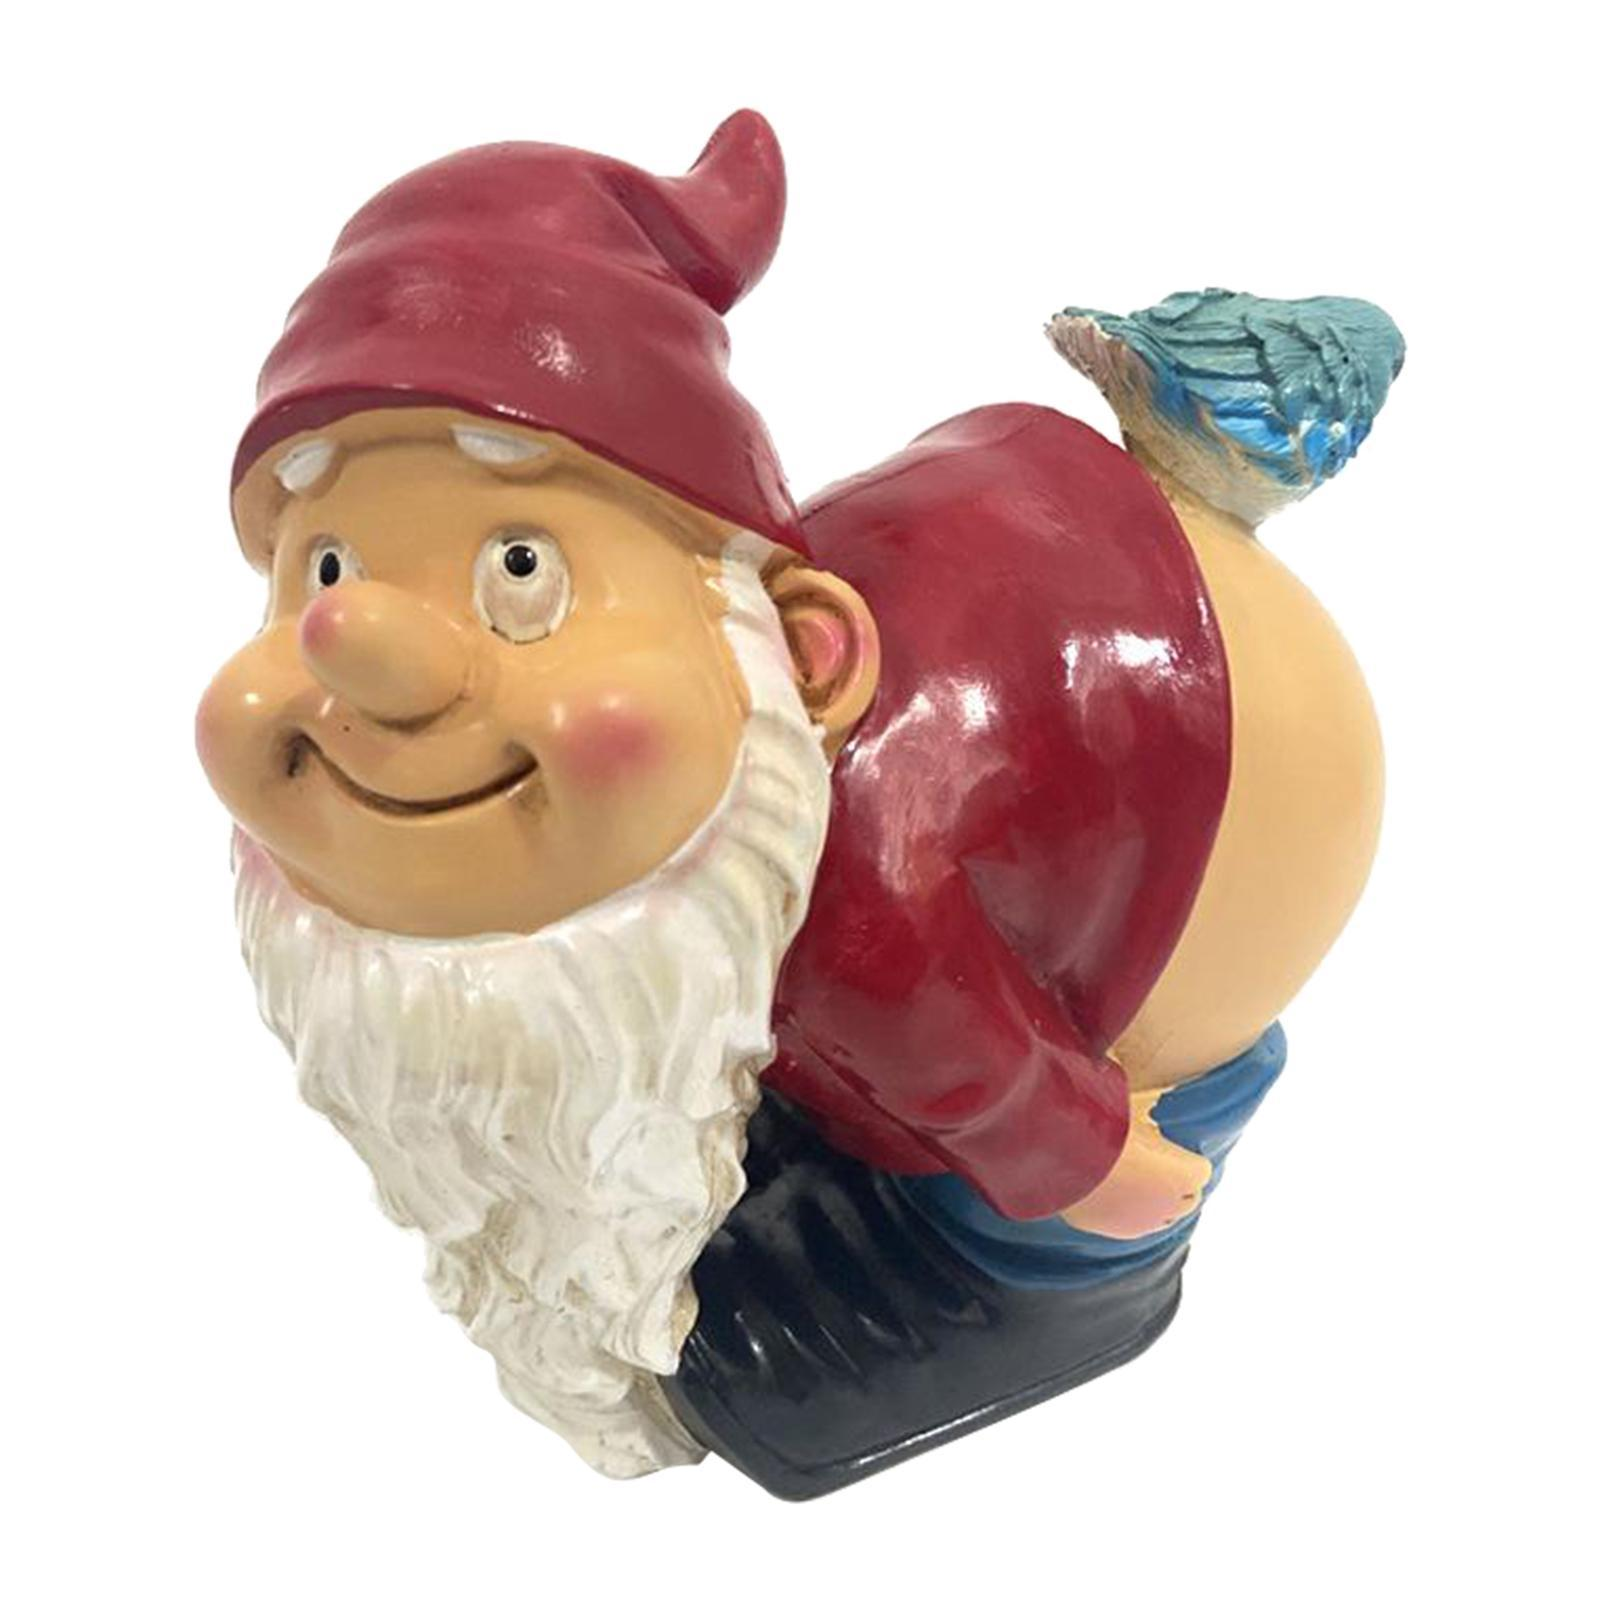 thumbnail 19 - Funny Resin Naughty Garden Gnome Statue Ornaments Outdoor Villa Home Figurines